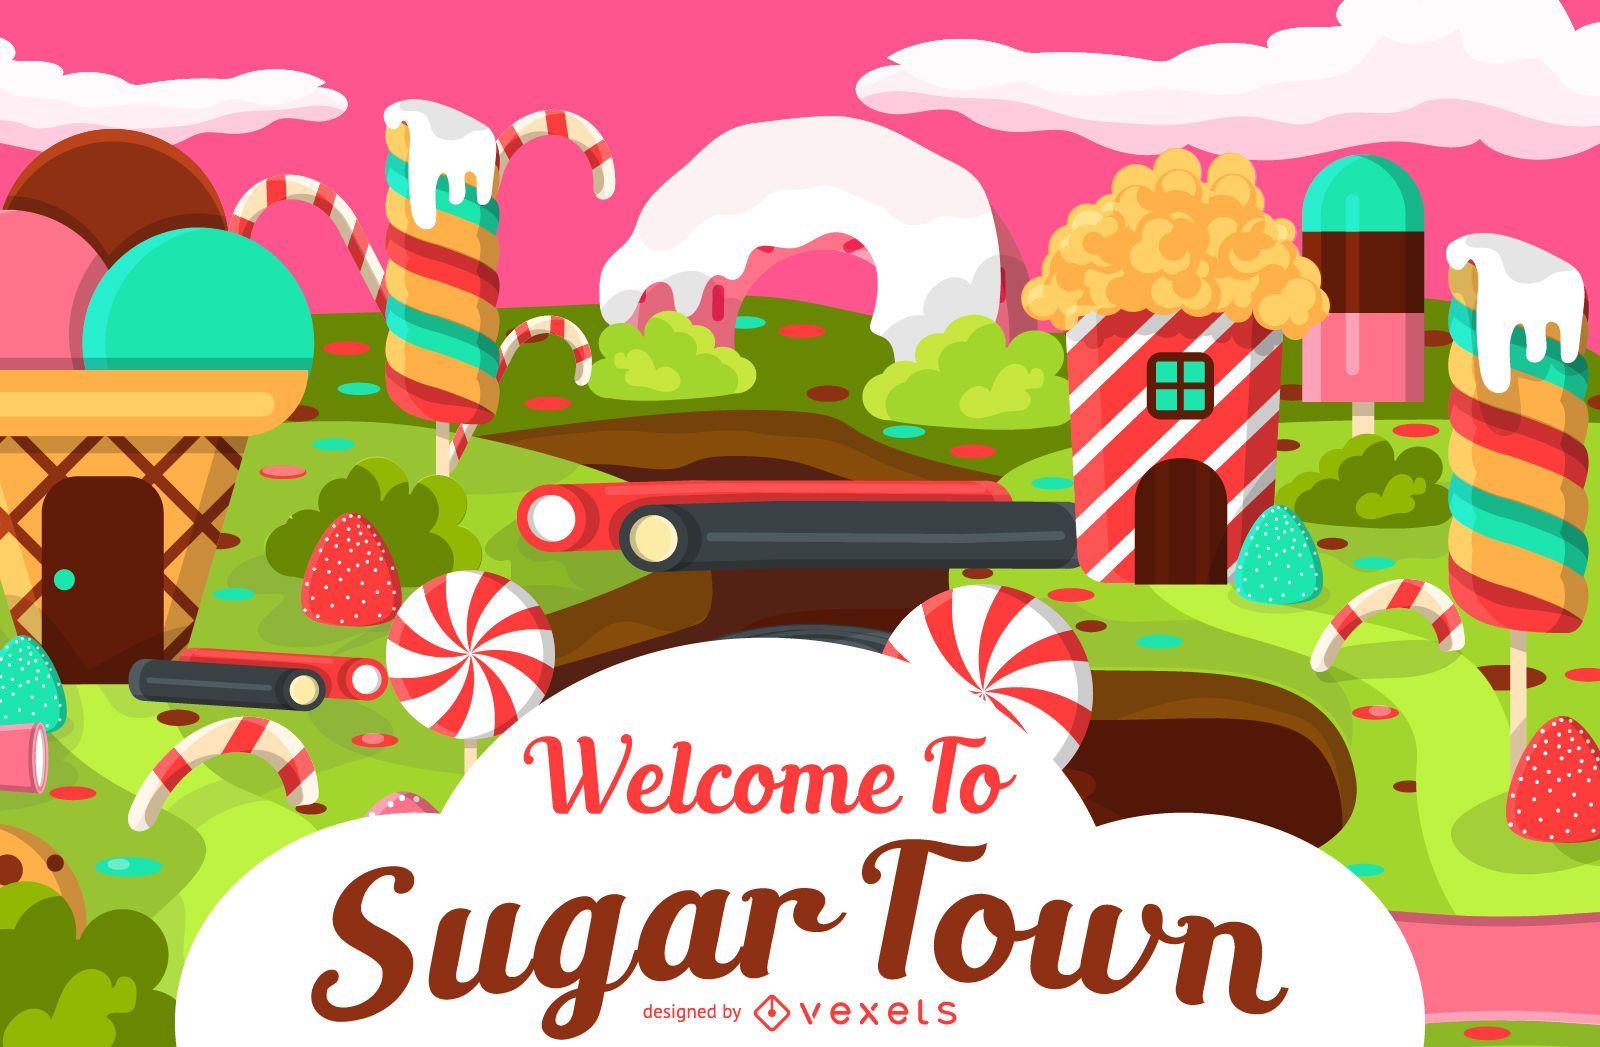 Sugar town candy illustration